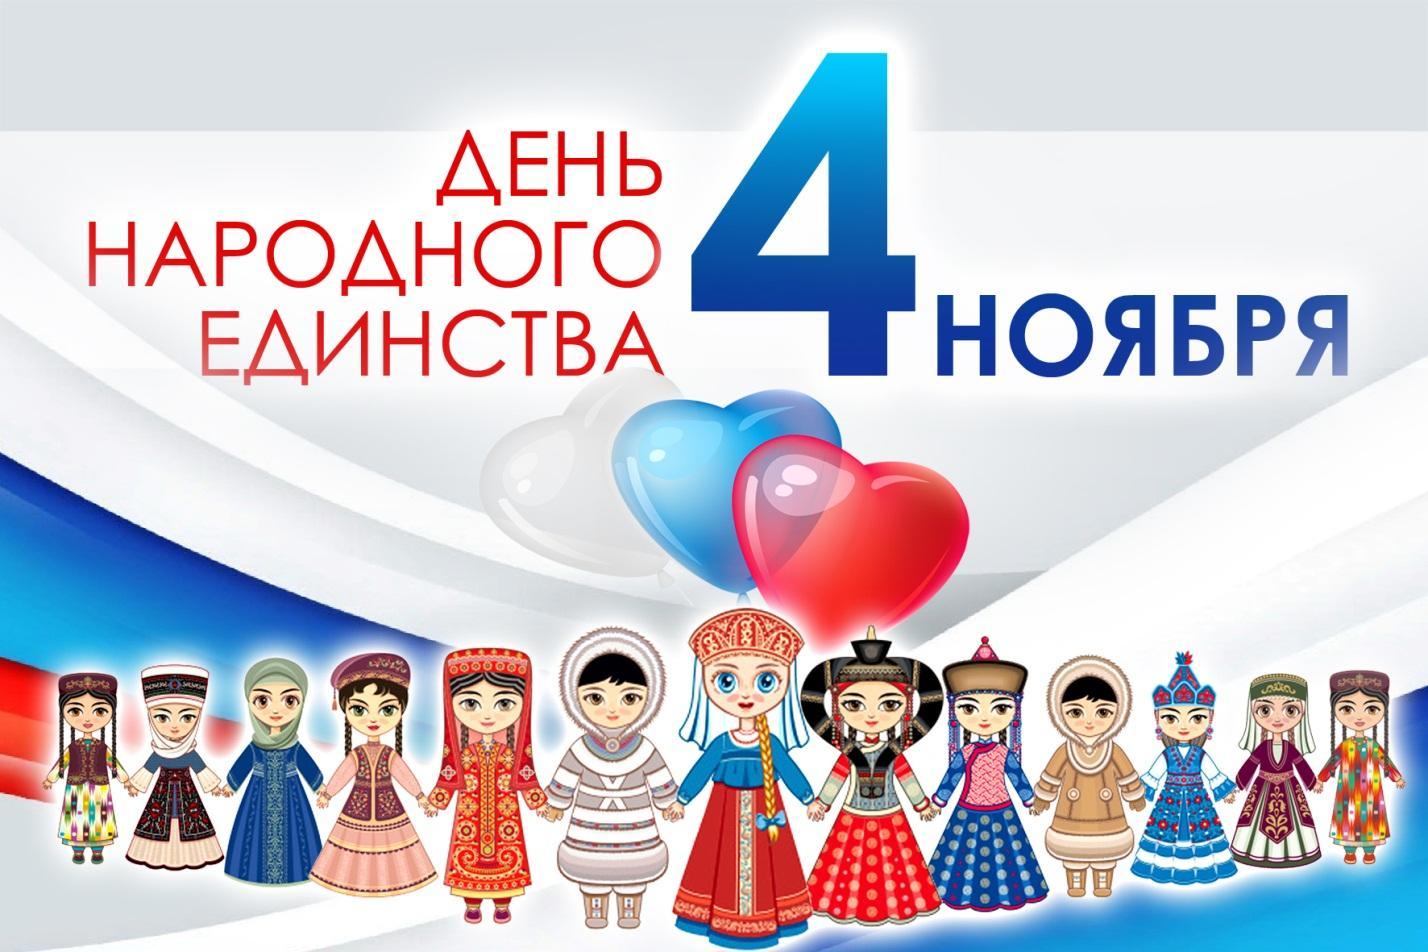 http://vlasova.ru/wp-content/uploads/2015/11/kartinka-den-narodnogo-edinstva.jpg